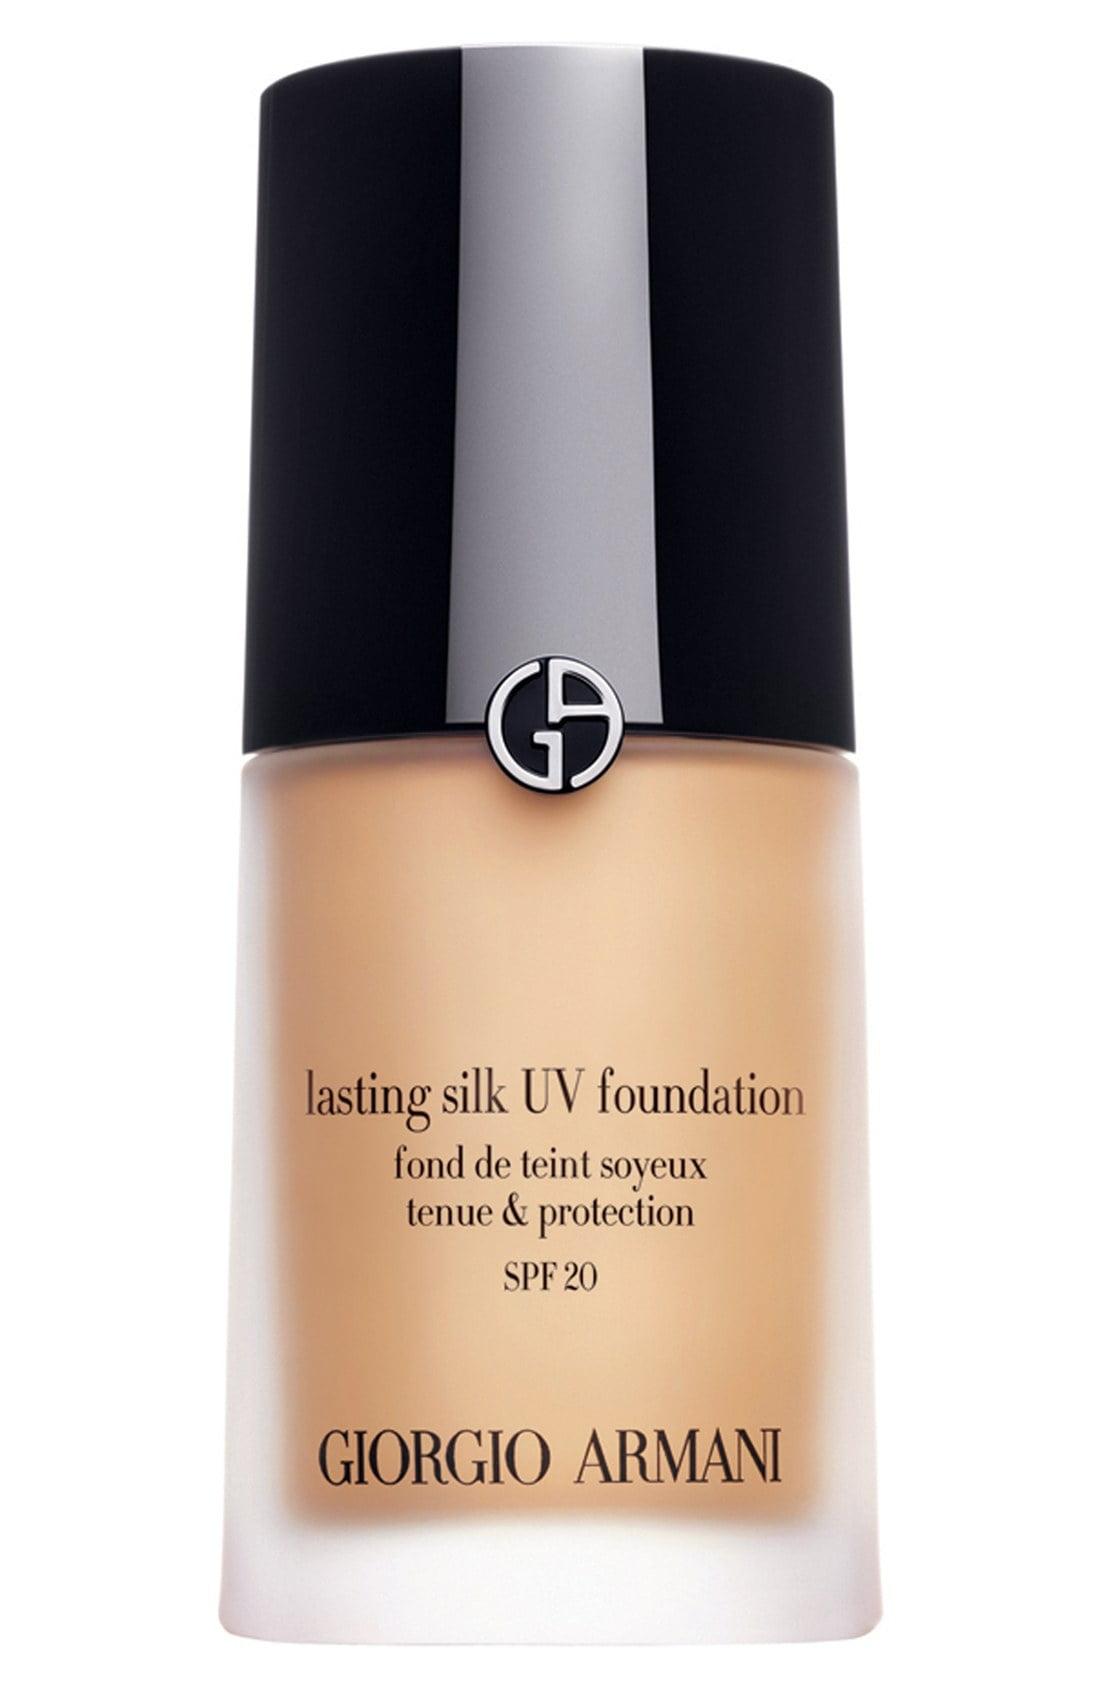 Lasting Silk Uv Foundation Spf 20 - 7 Tan